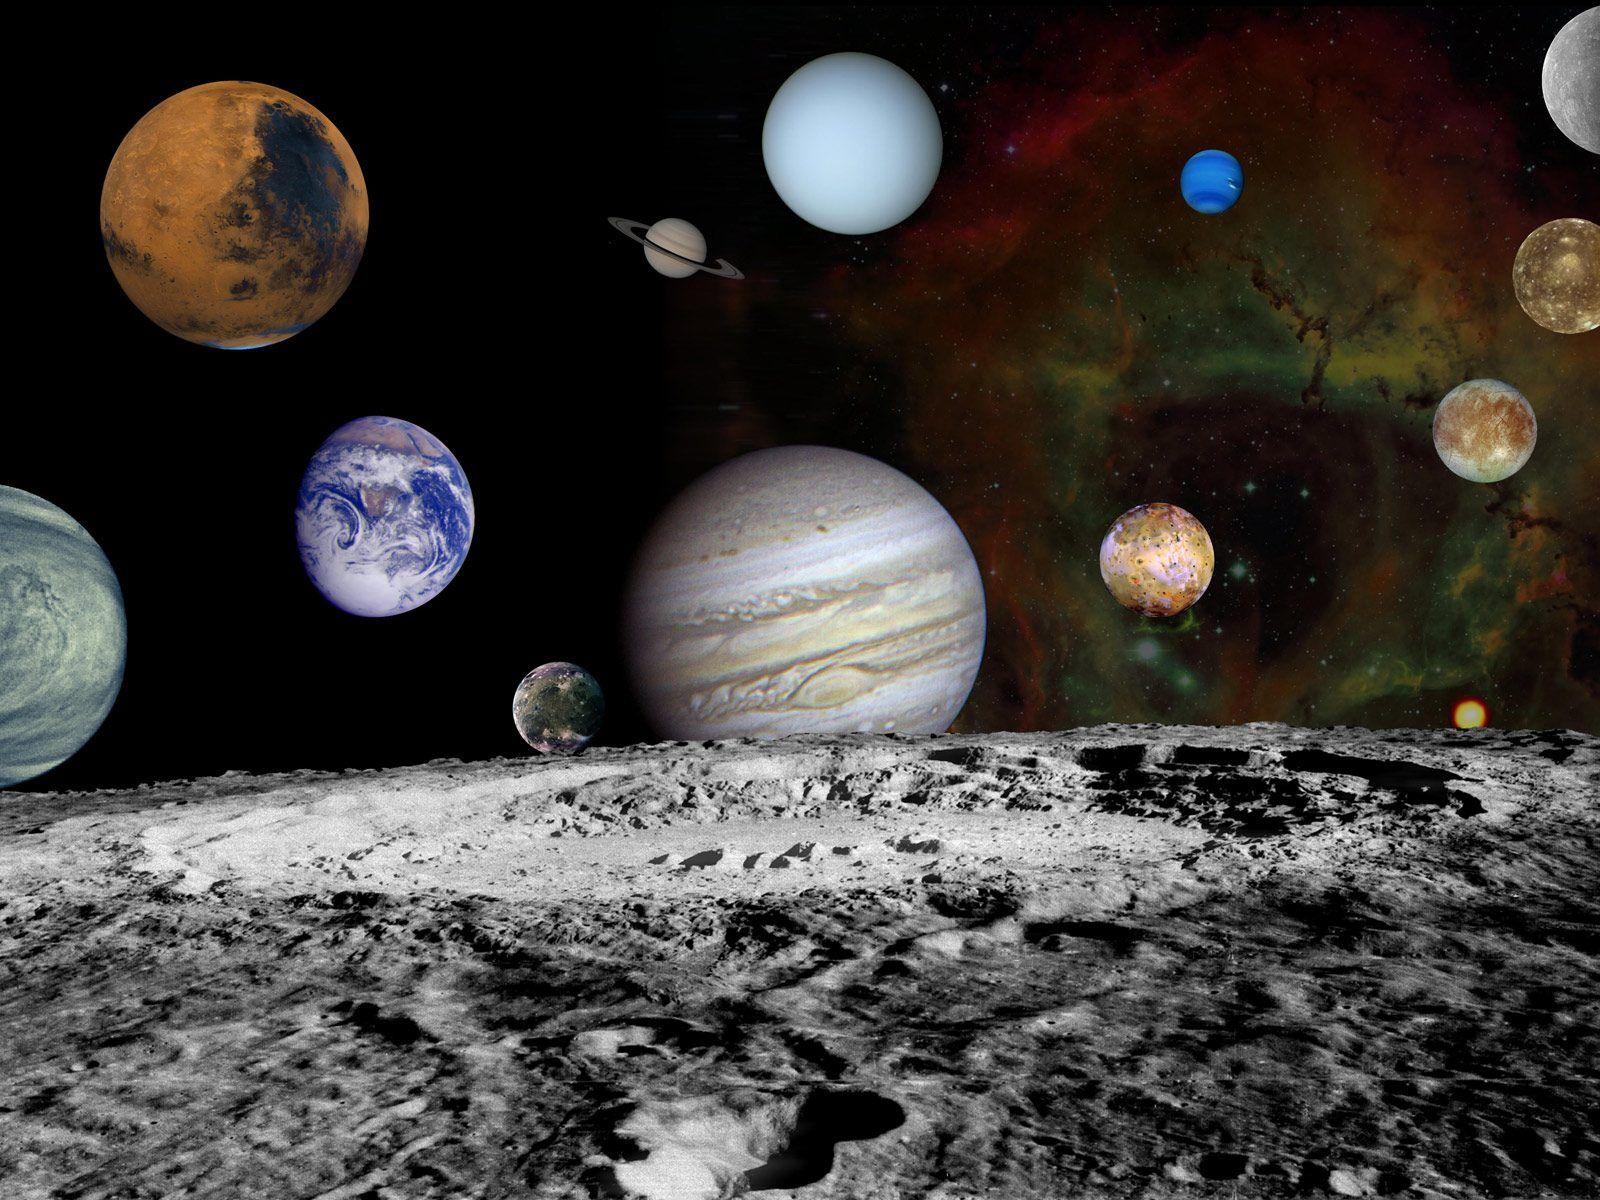 Pin von Gamze Aslan auf Solar System / Moon / Sky | Pinterest